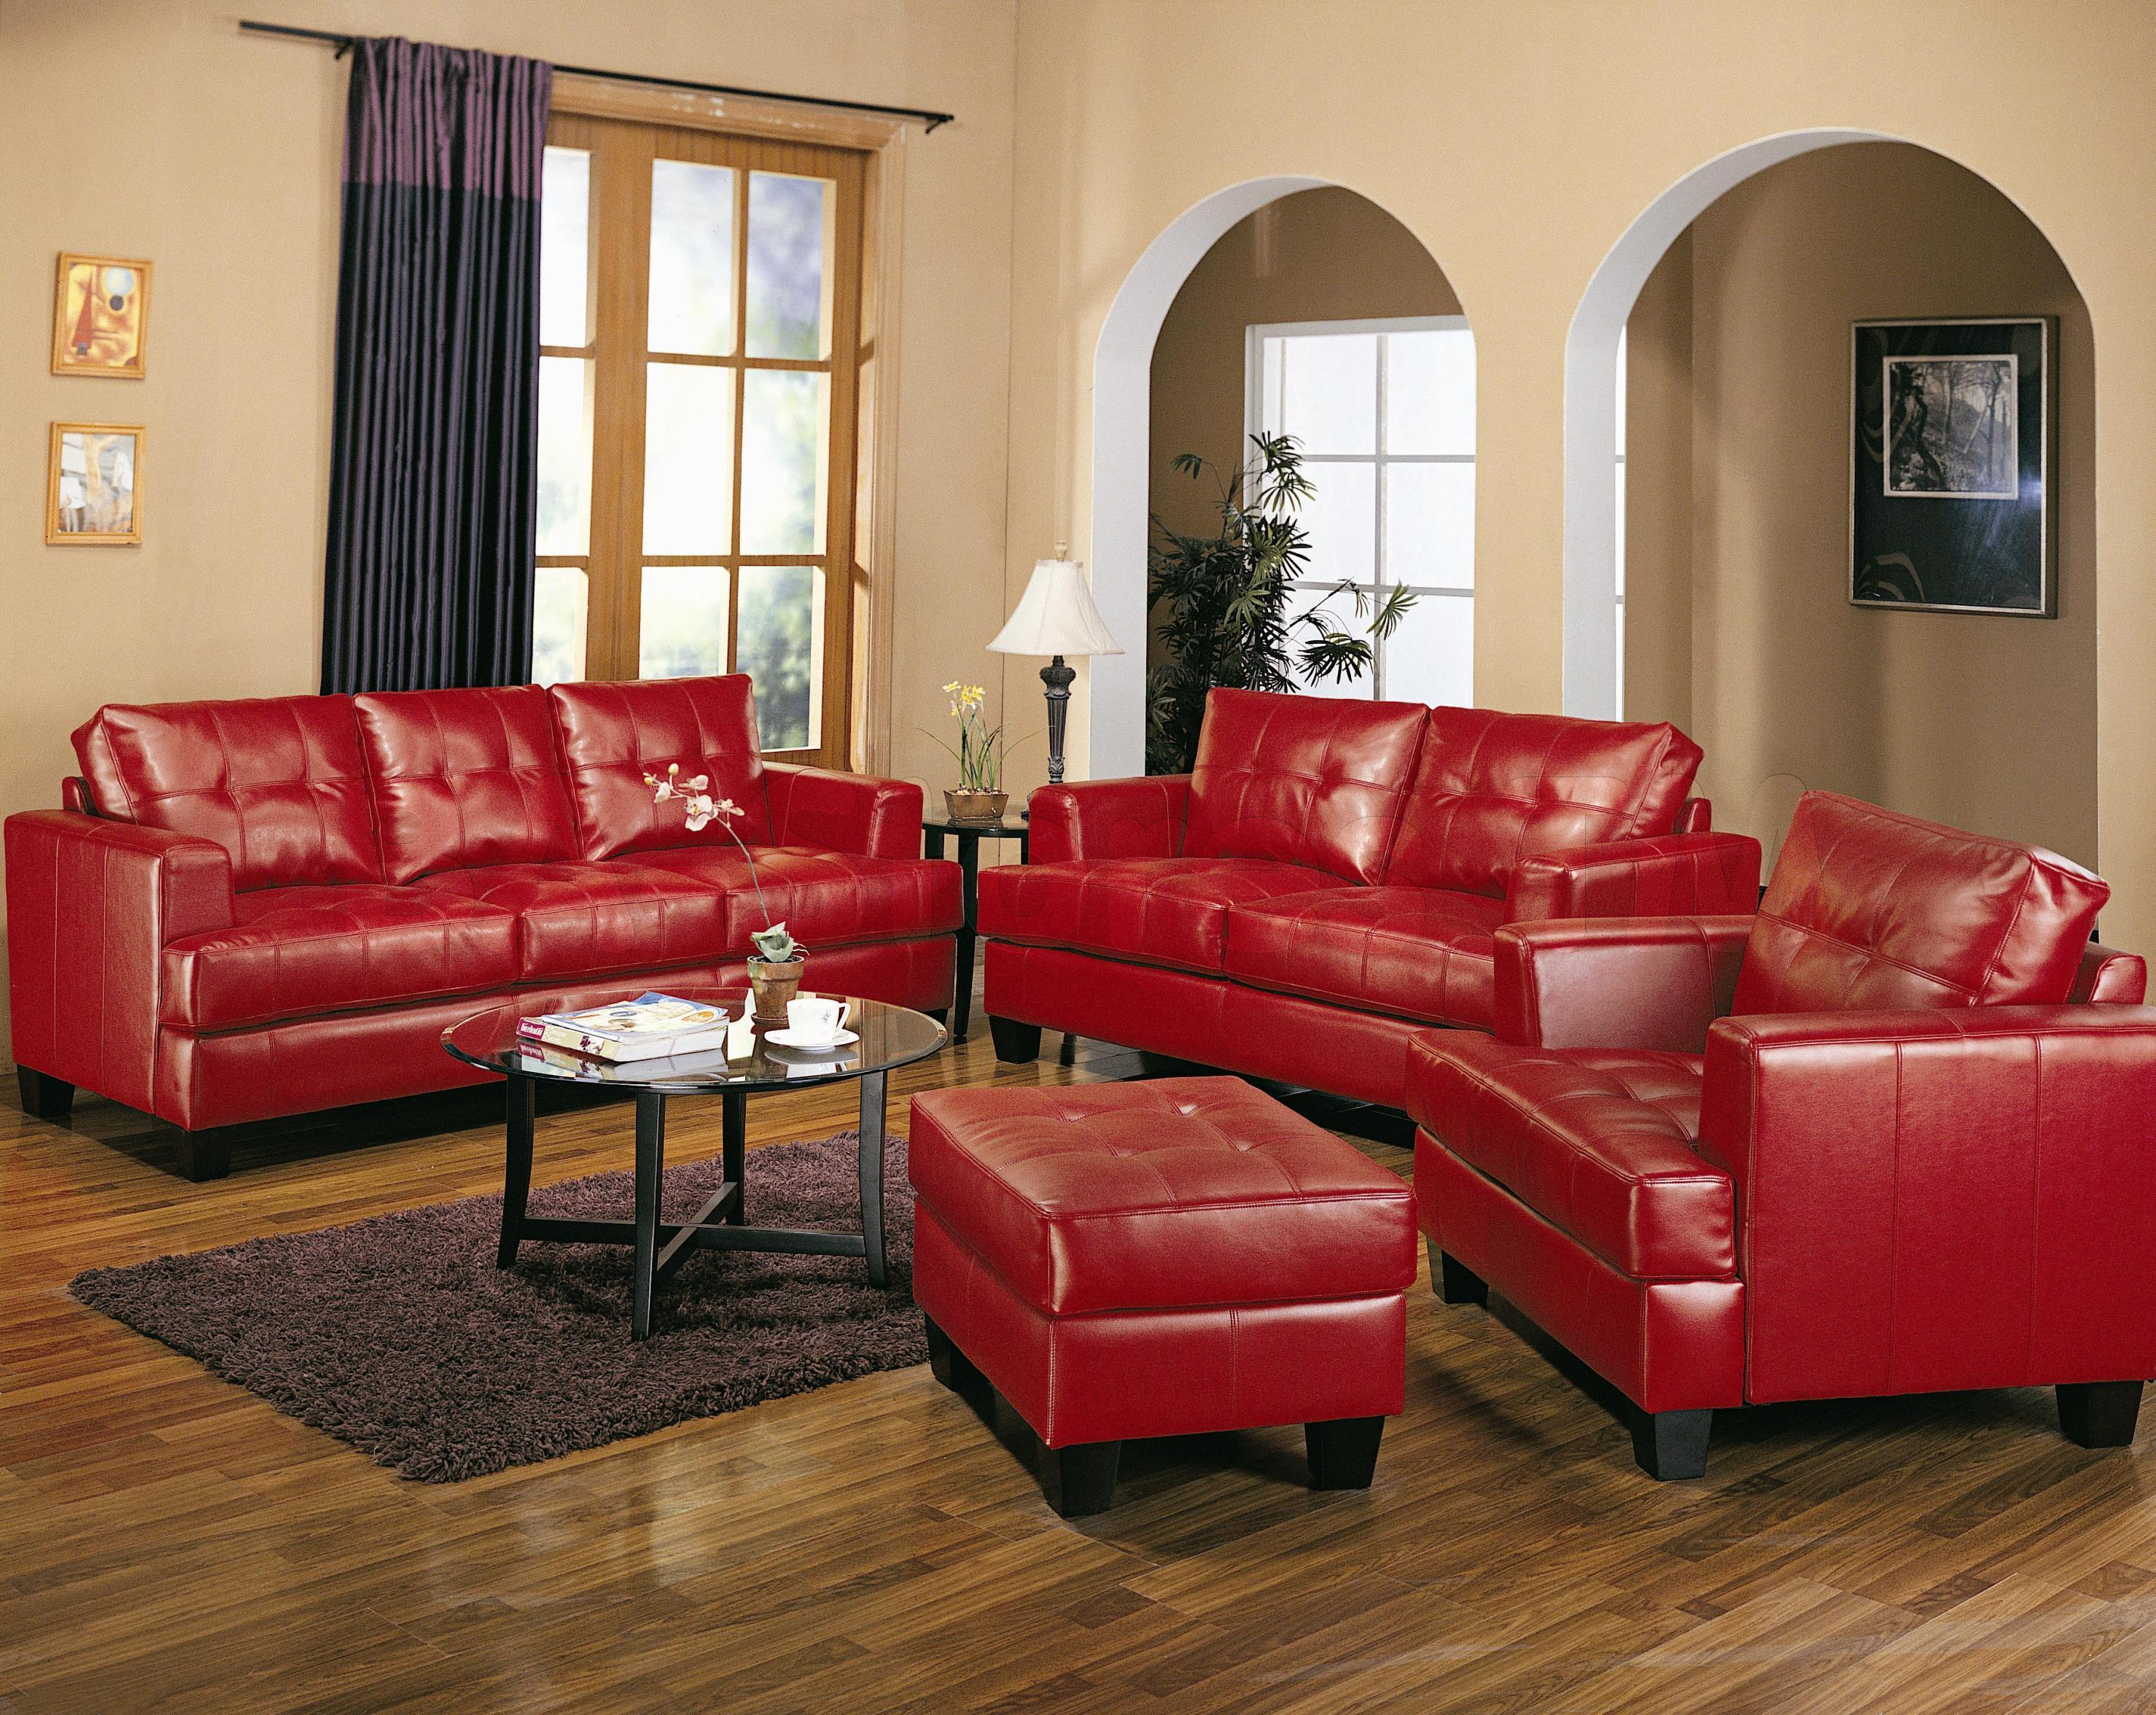 Styles Living Room Furniture-11,Via